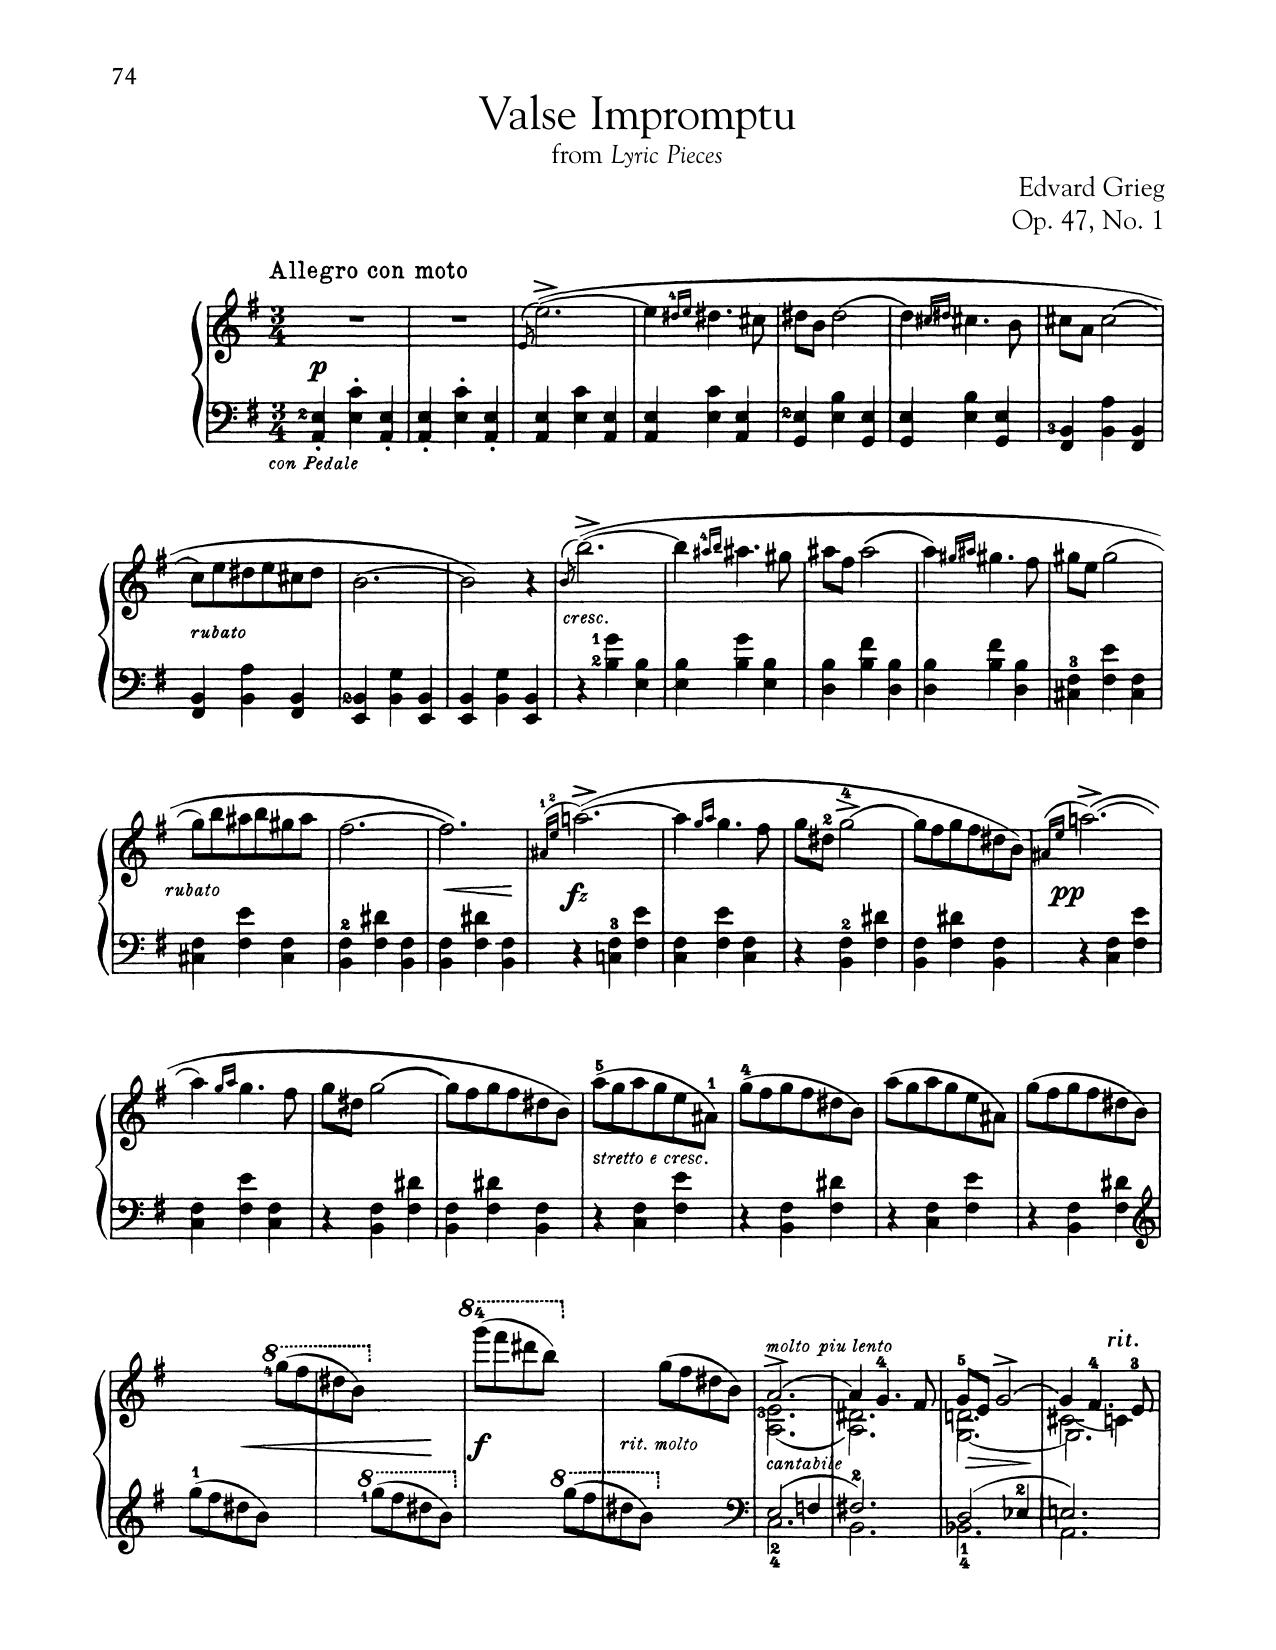 Valse Impromptu, Op. 47, No. 1 (Piano Solo)